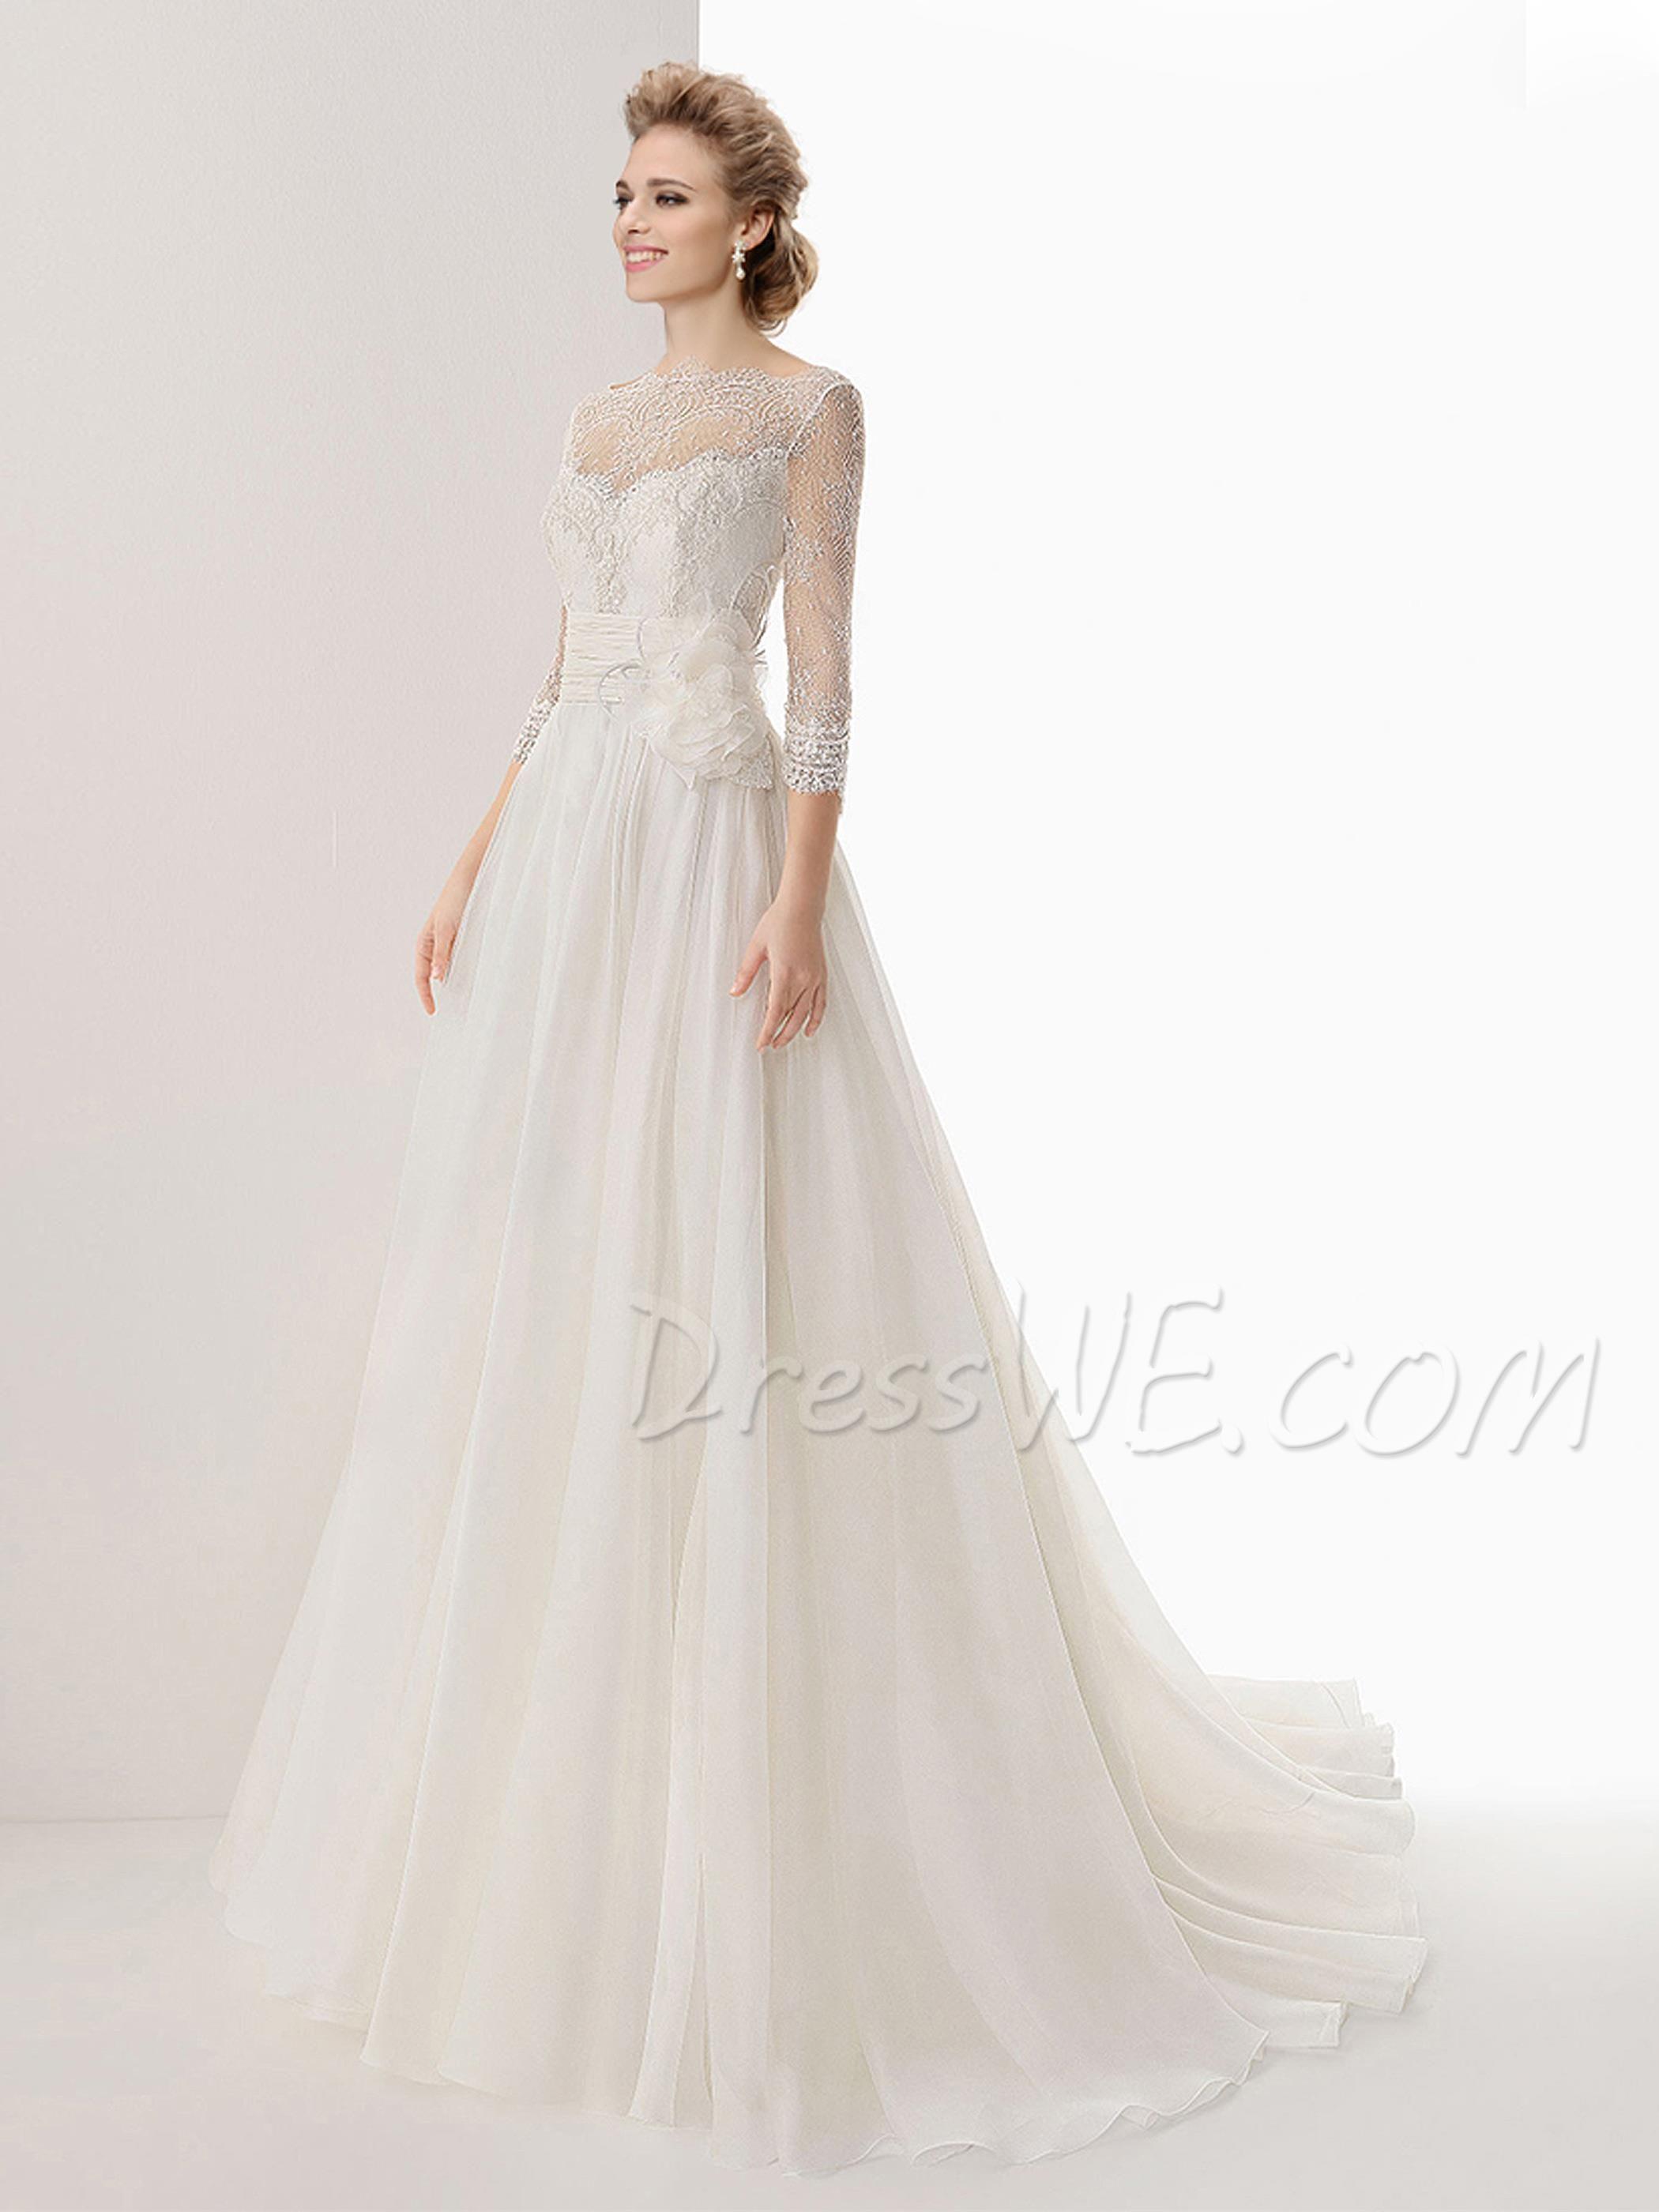 $183.39 Dresswe.comサプライ品ファッショナブルなAラインバトーハーフスリーブのレースウェディングドレス